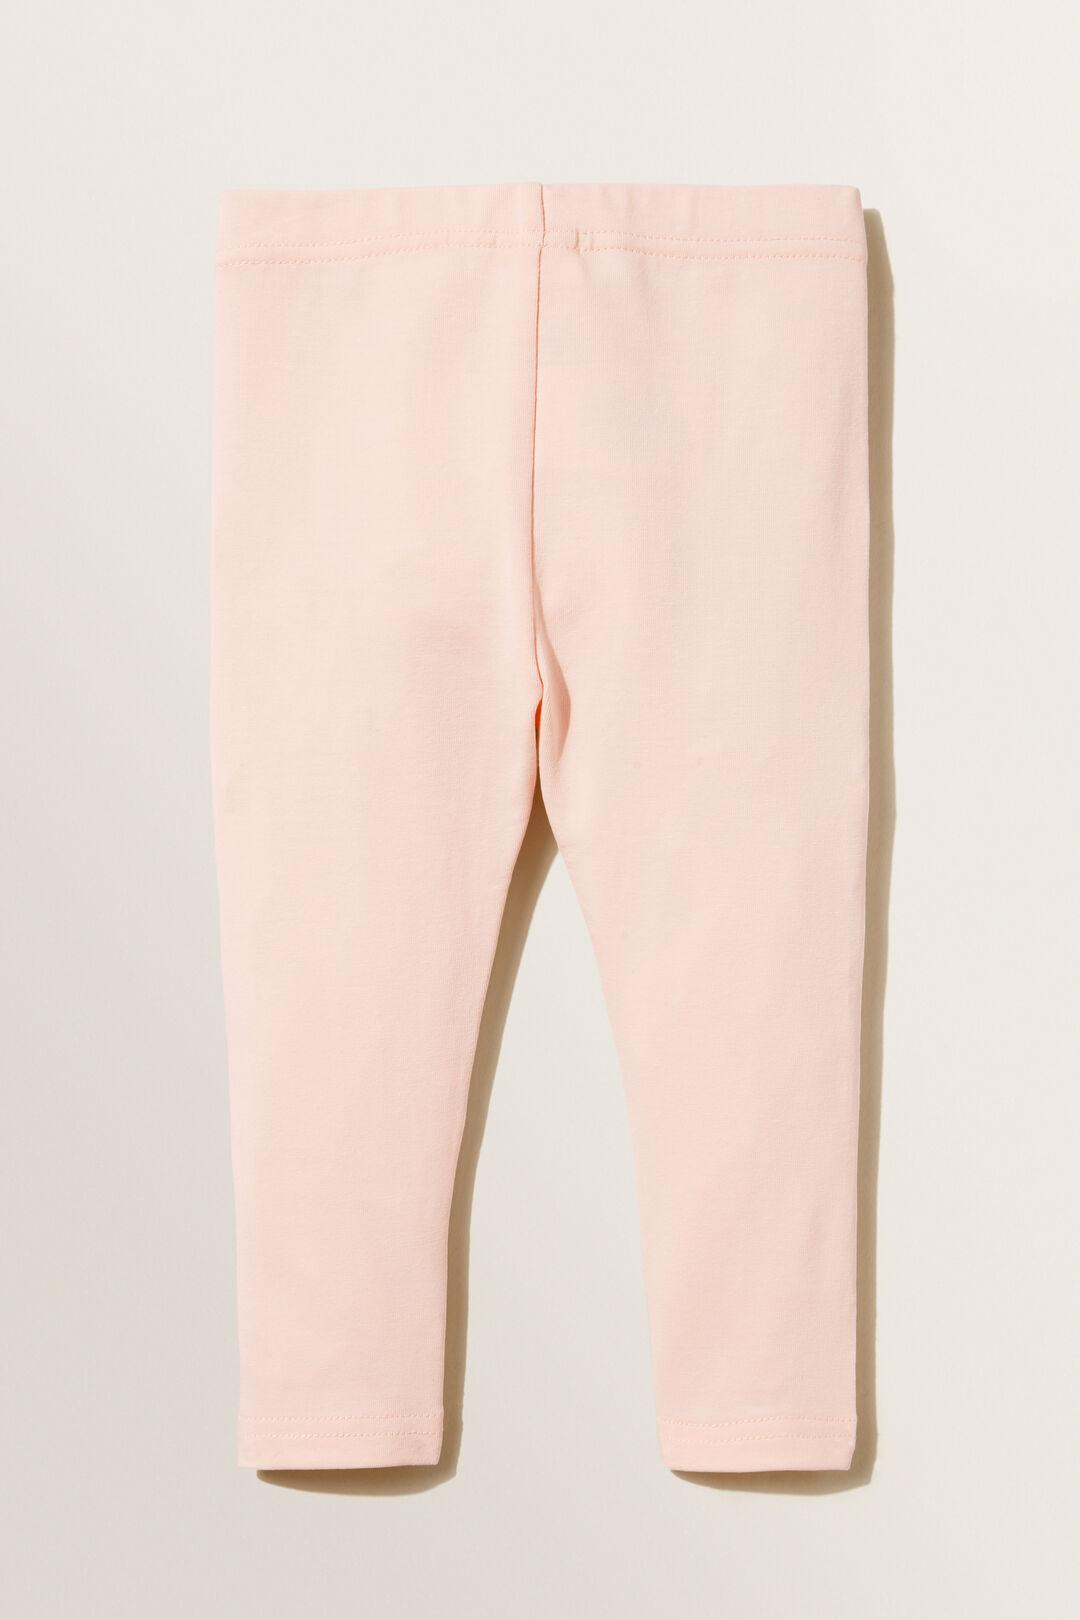 Basic Leggings  Dusty Rose  hi-res